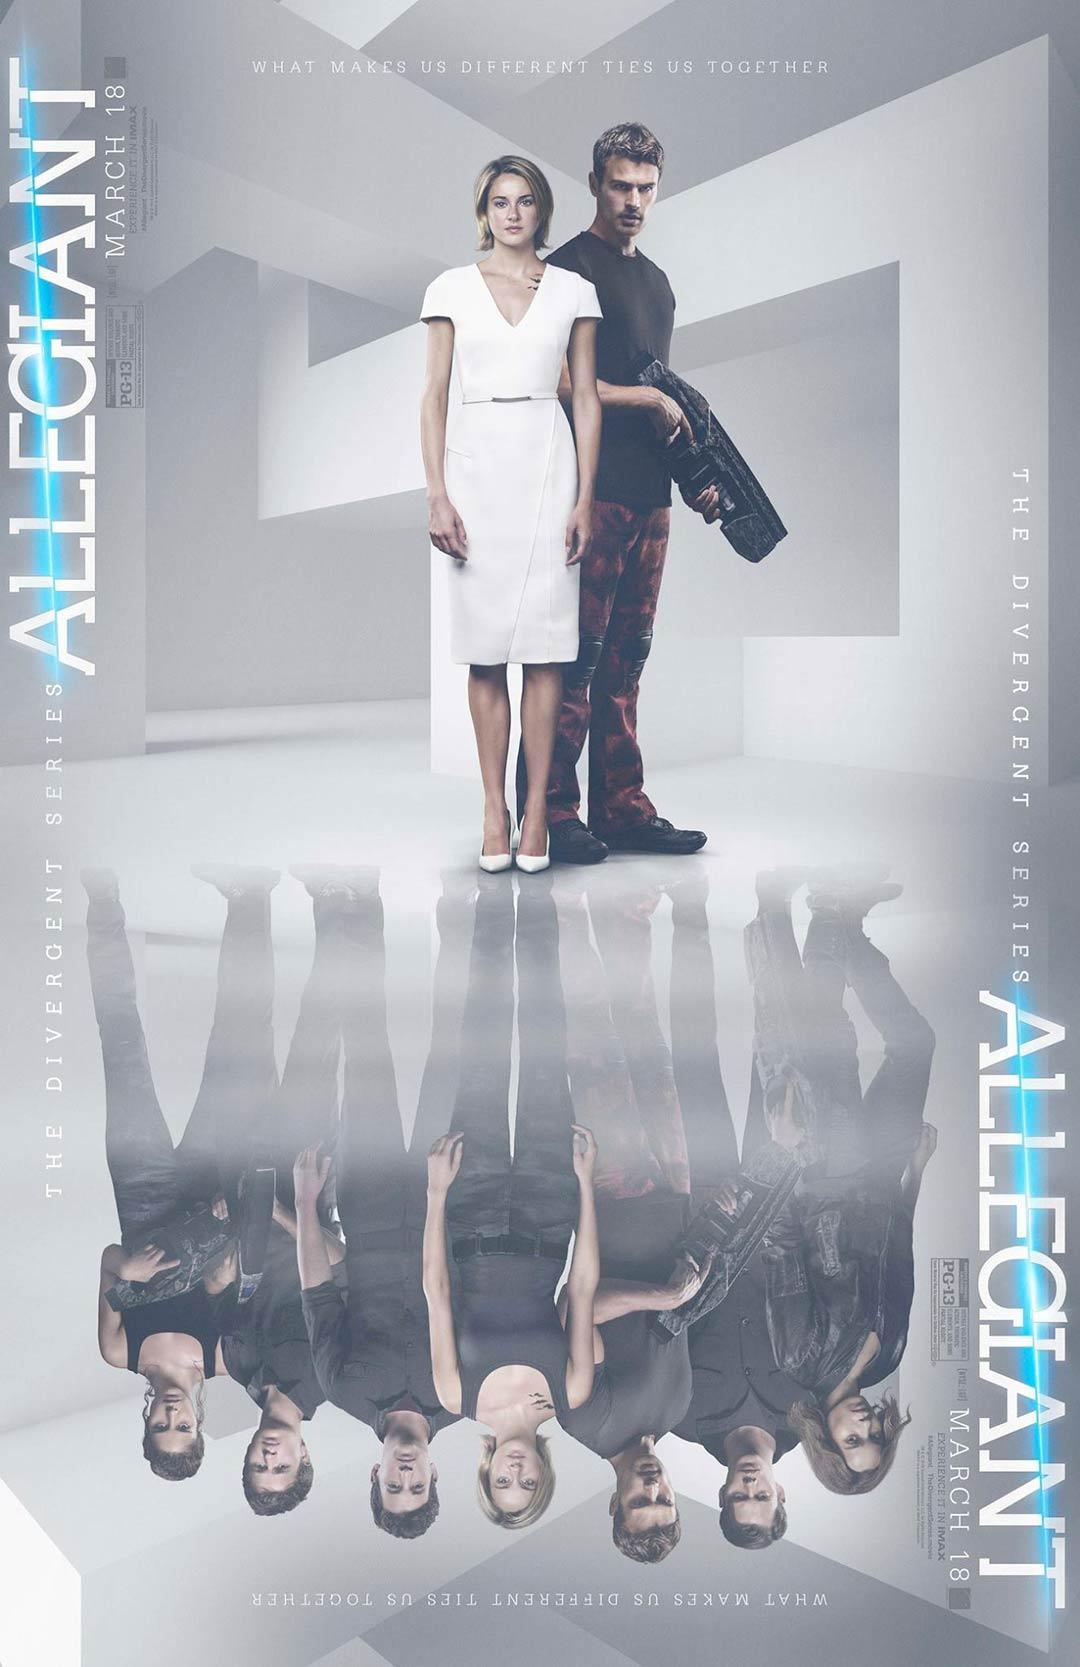 The Divergent Series: Allegiant Poster #12